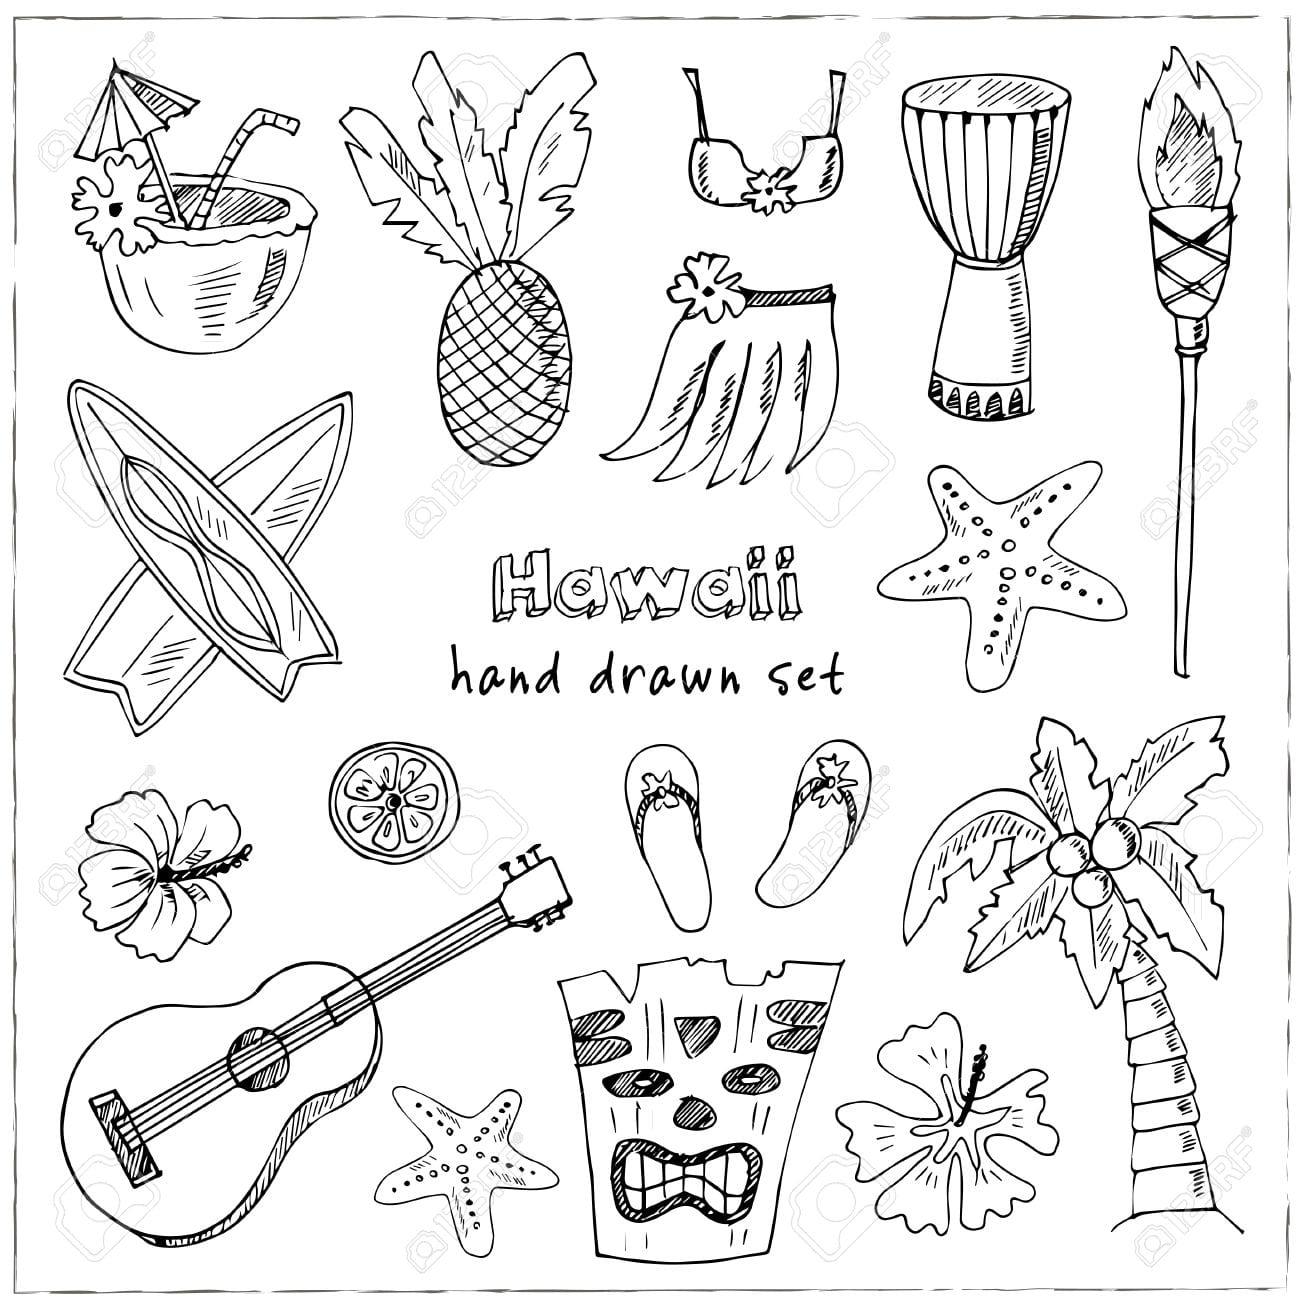 Hawaii Symbols And Icons, Including Hula Skirt, Tiki Gods, Totem